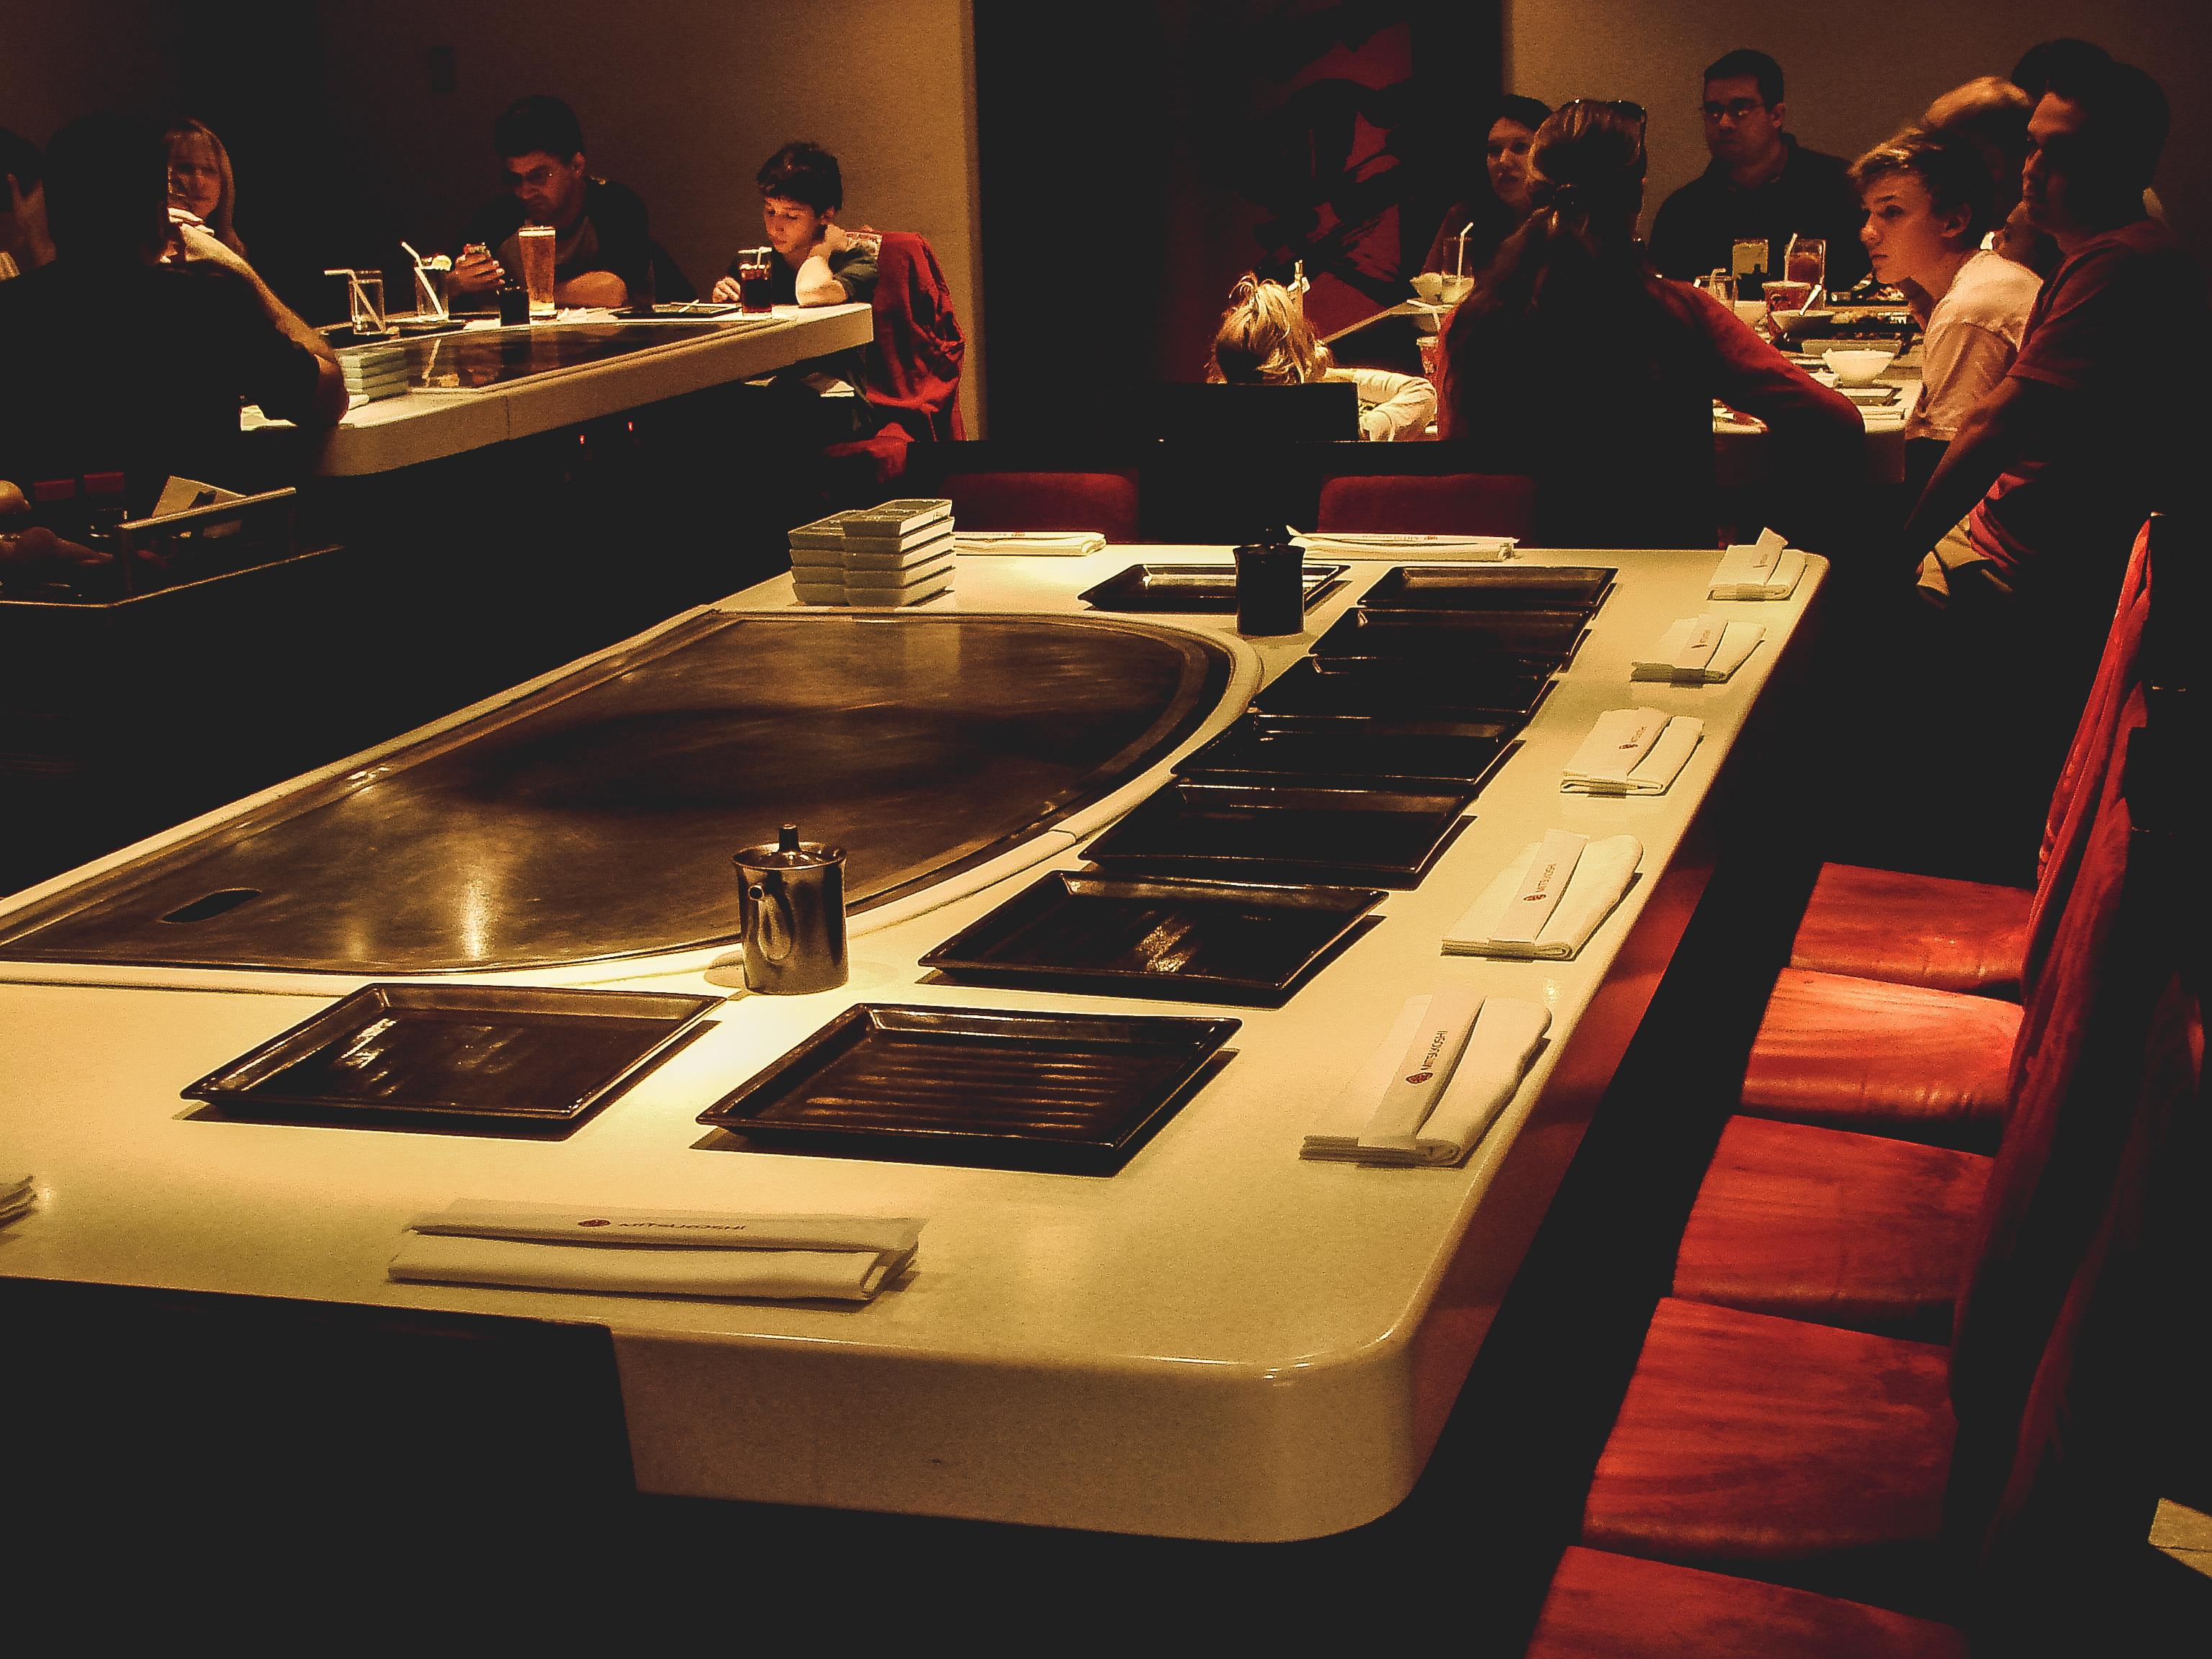 Worst Restaurants At Disney World Disney Dining Reviews - Teppan table